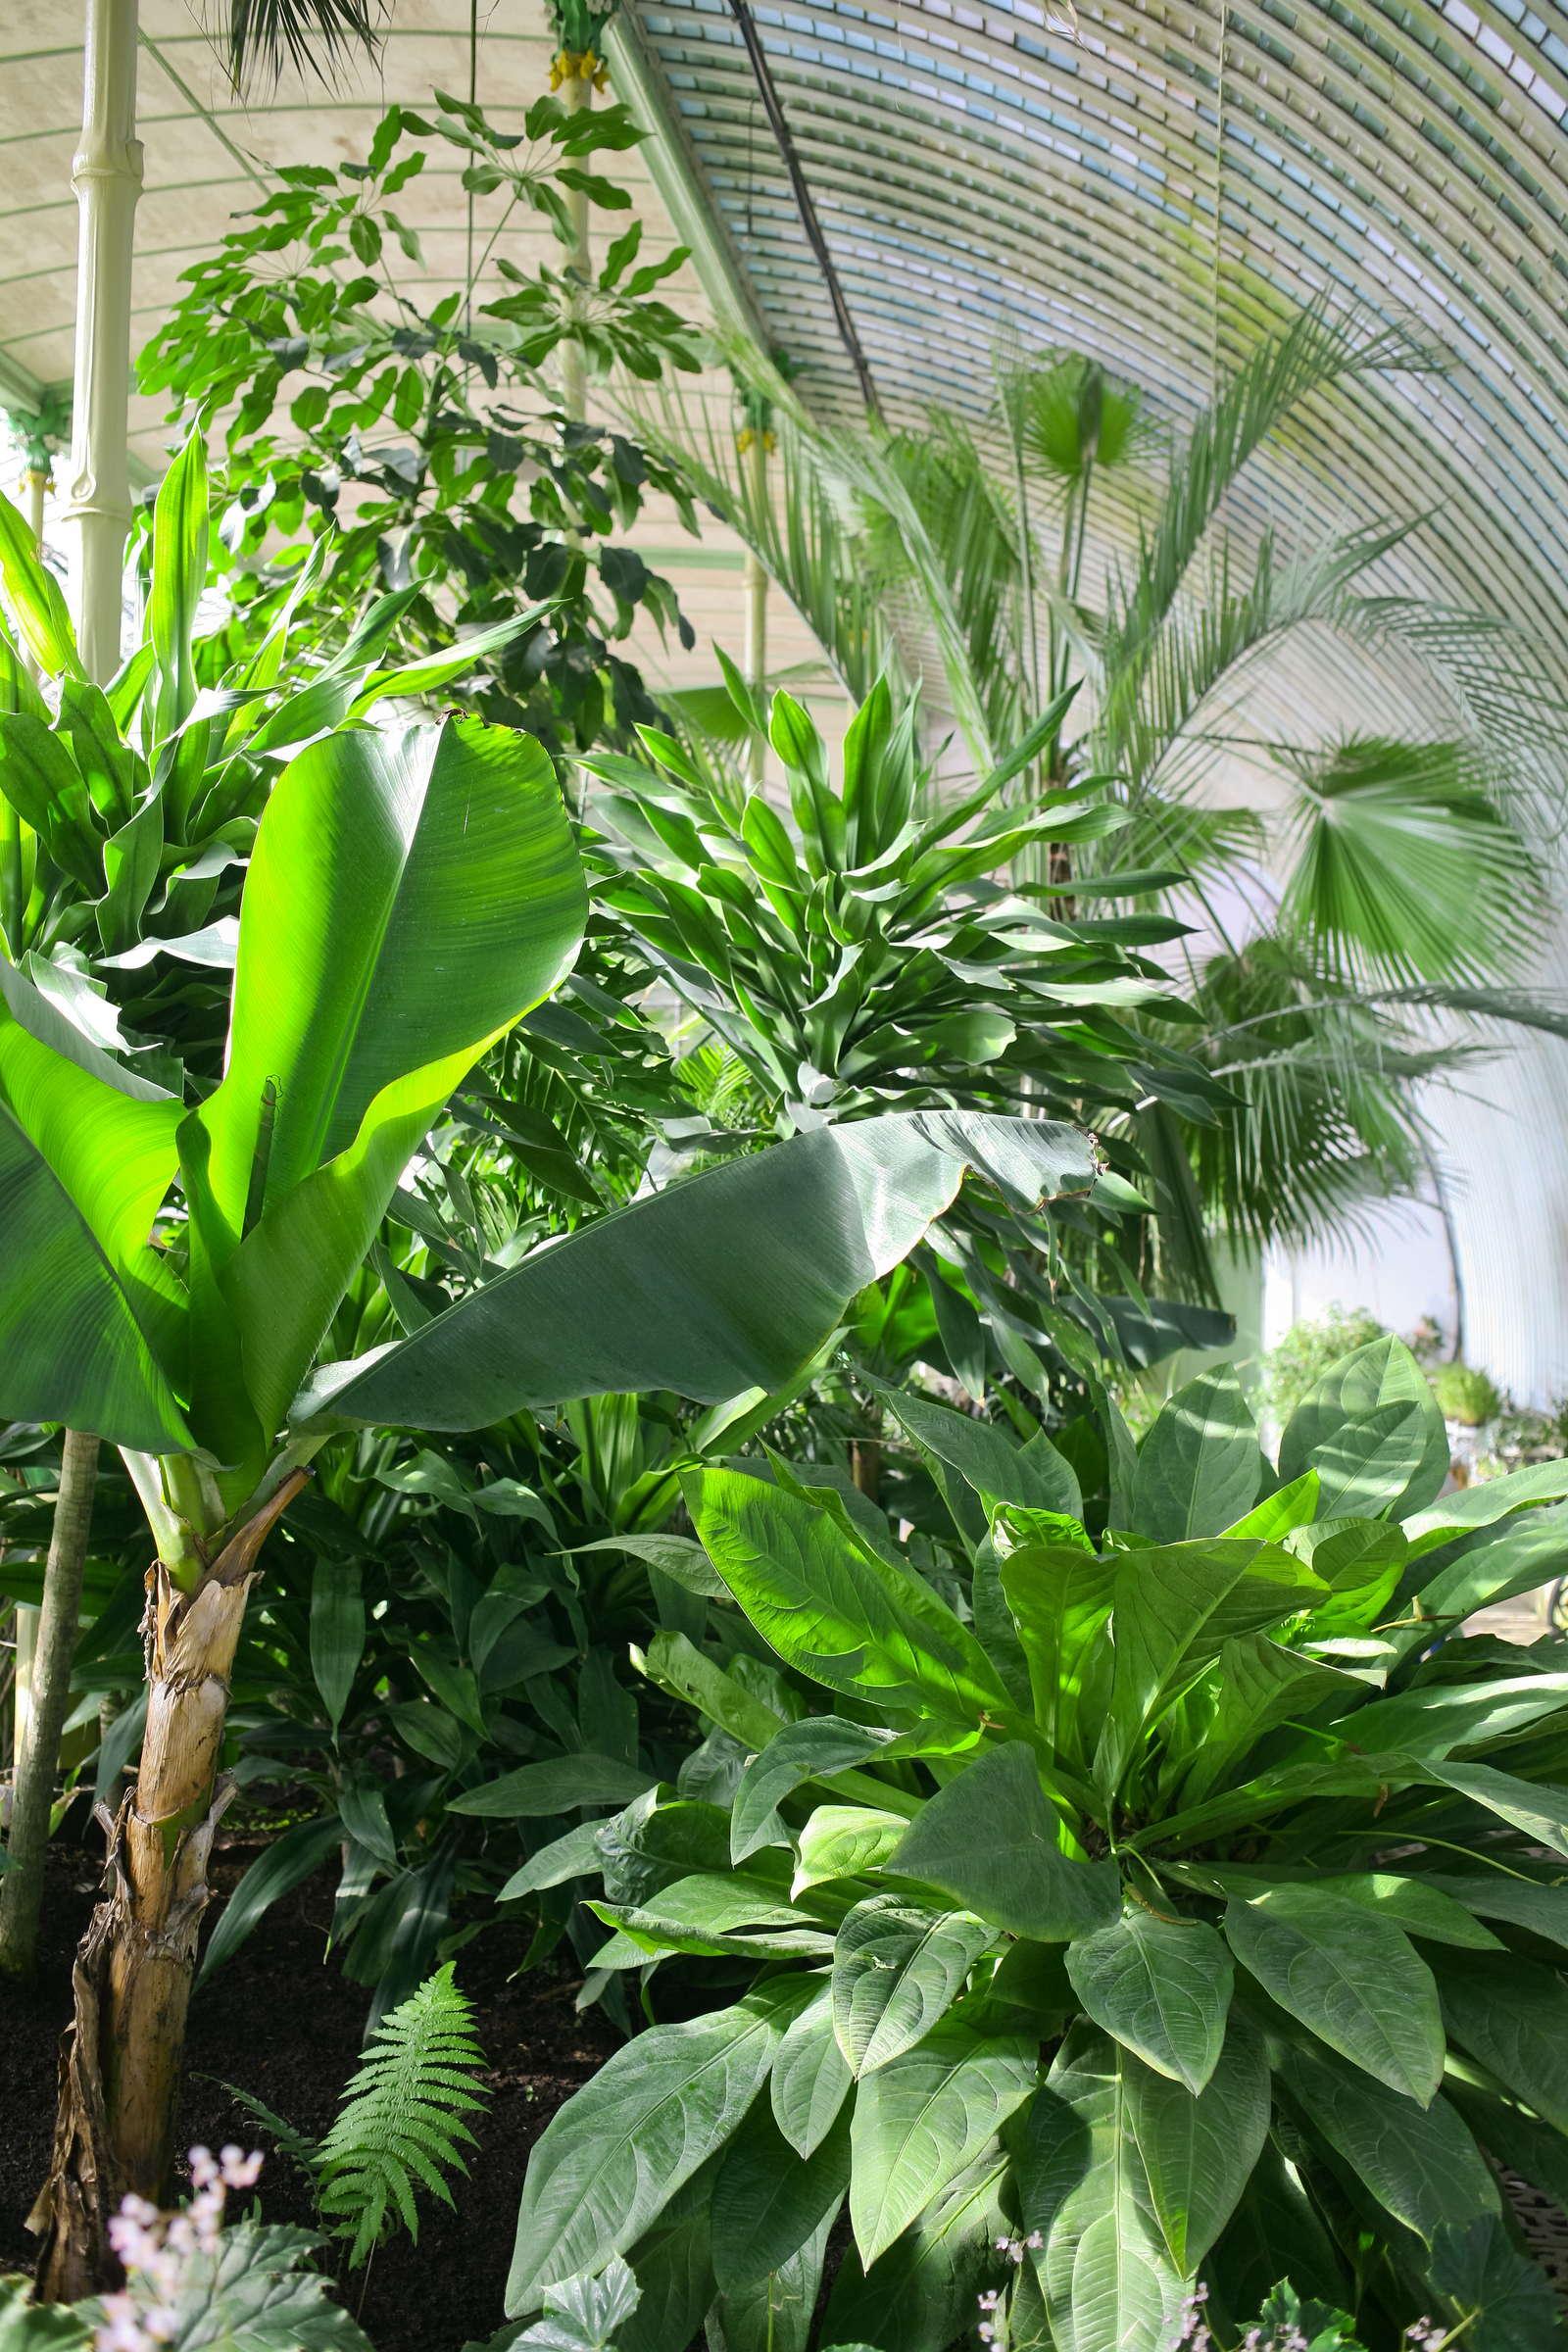 bananenbaum pflanzen bananenpflanze im eigenen garten pflanzen pflegen plantura. Black Bedroom Furniture Sets. Home Design Ideas